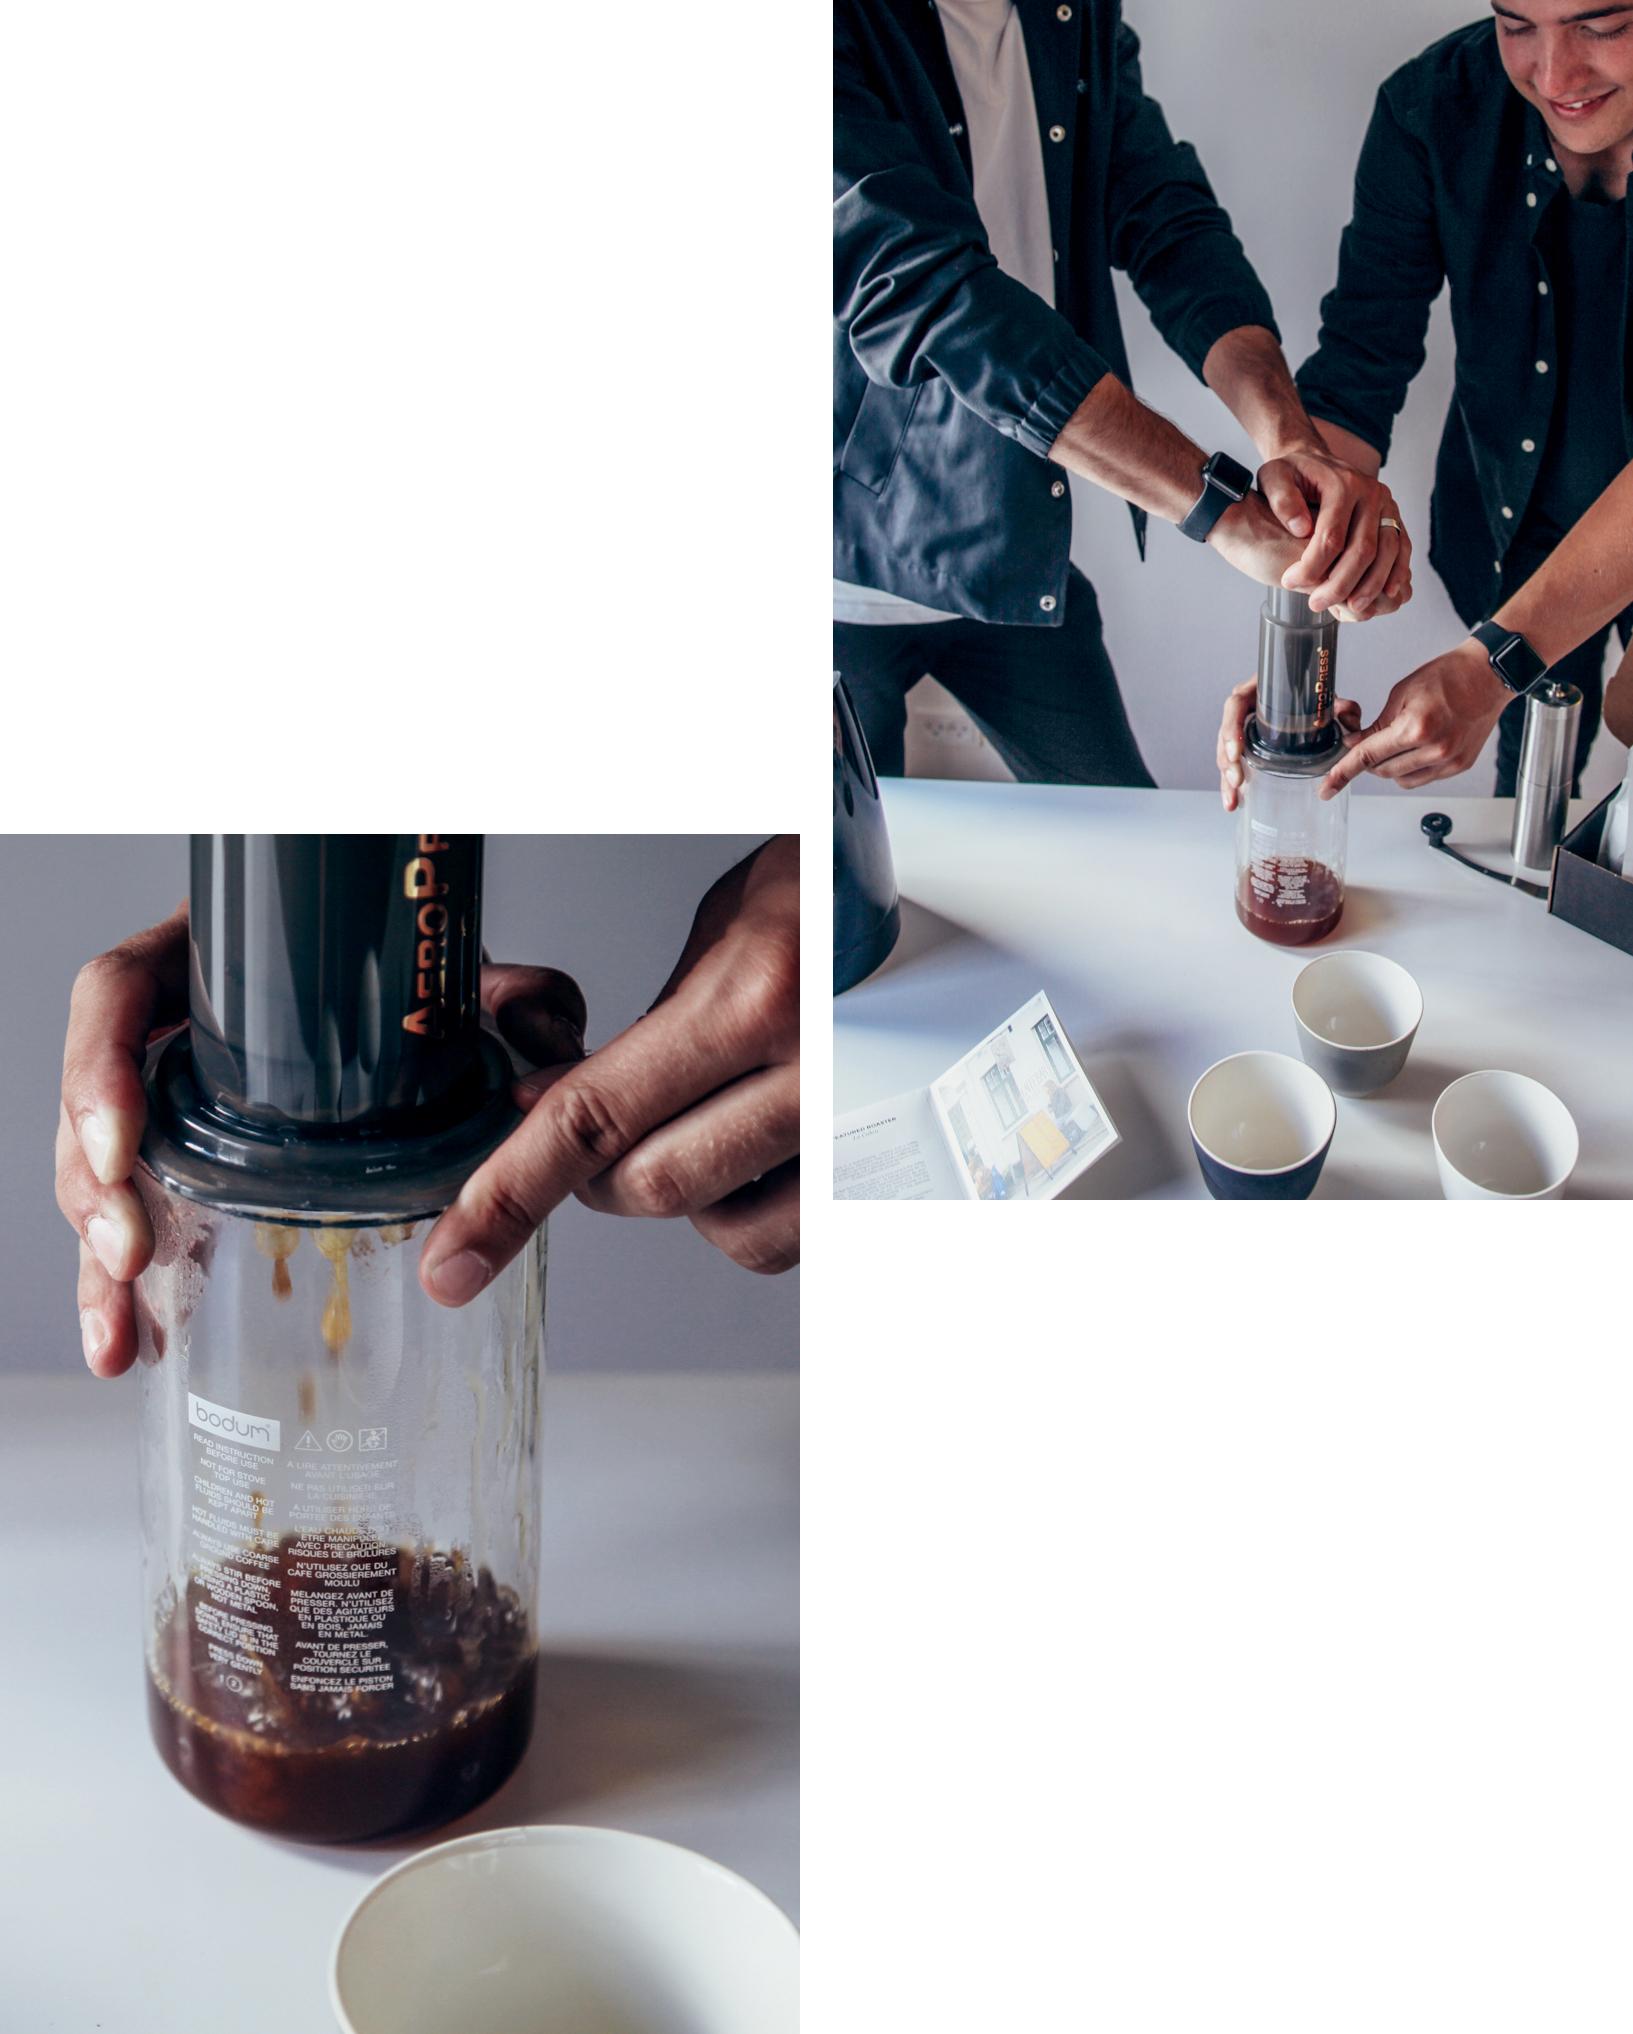 bean-bro-coffee-collage-2-scandianvia-standard